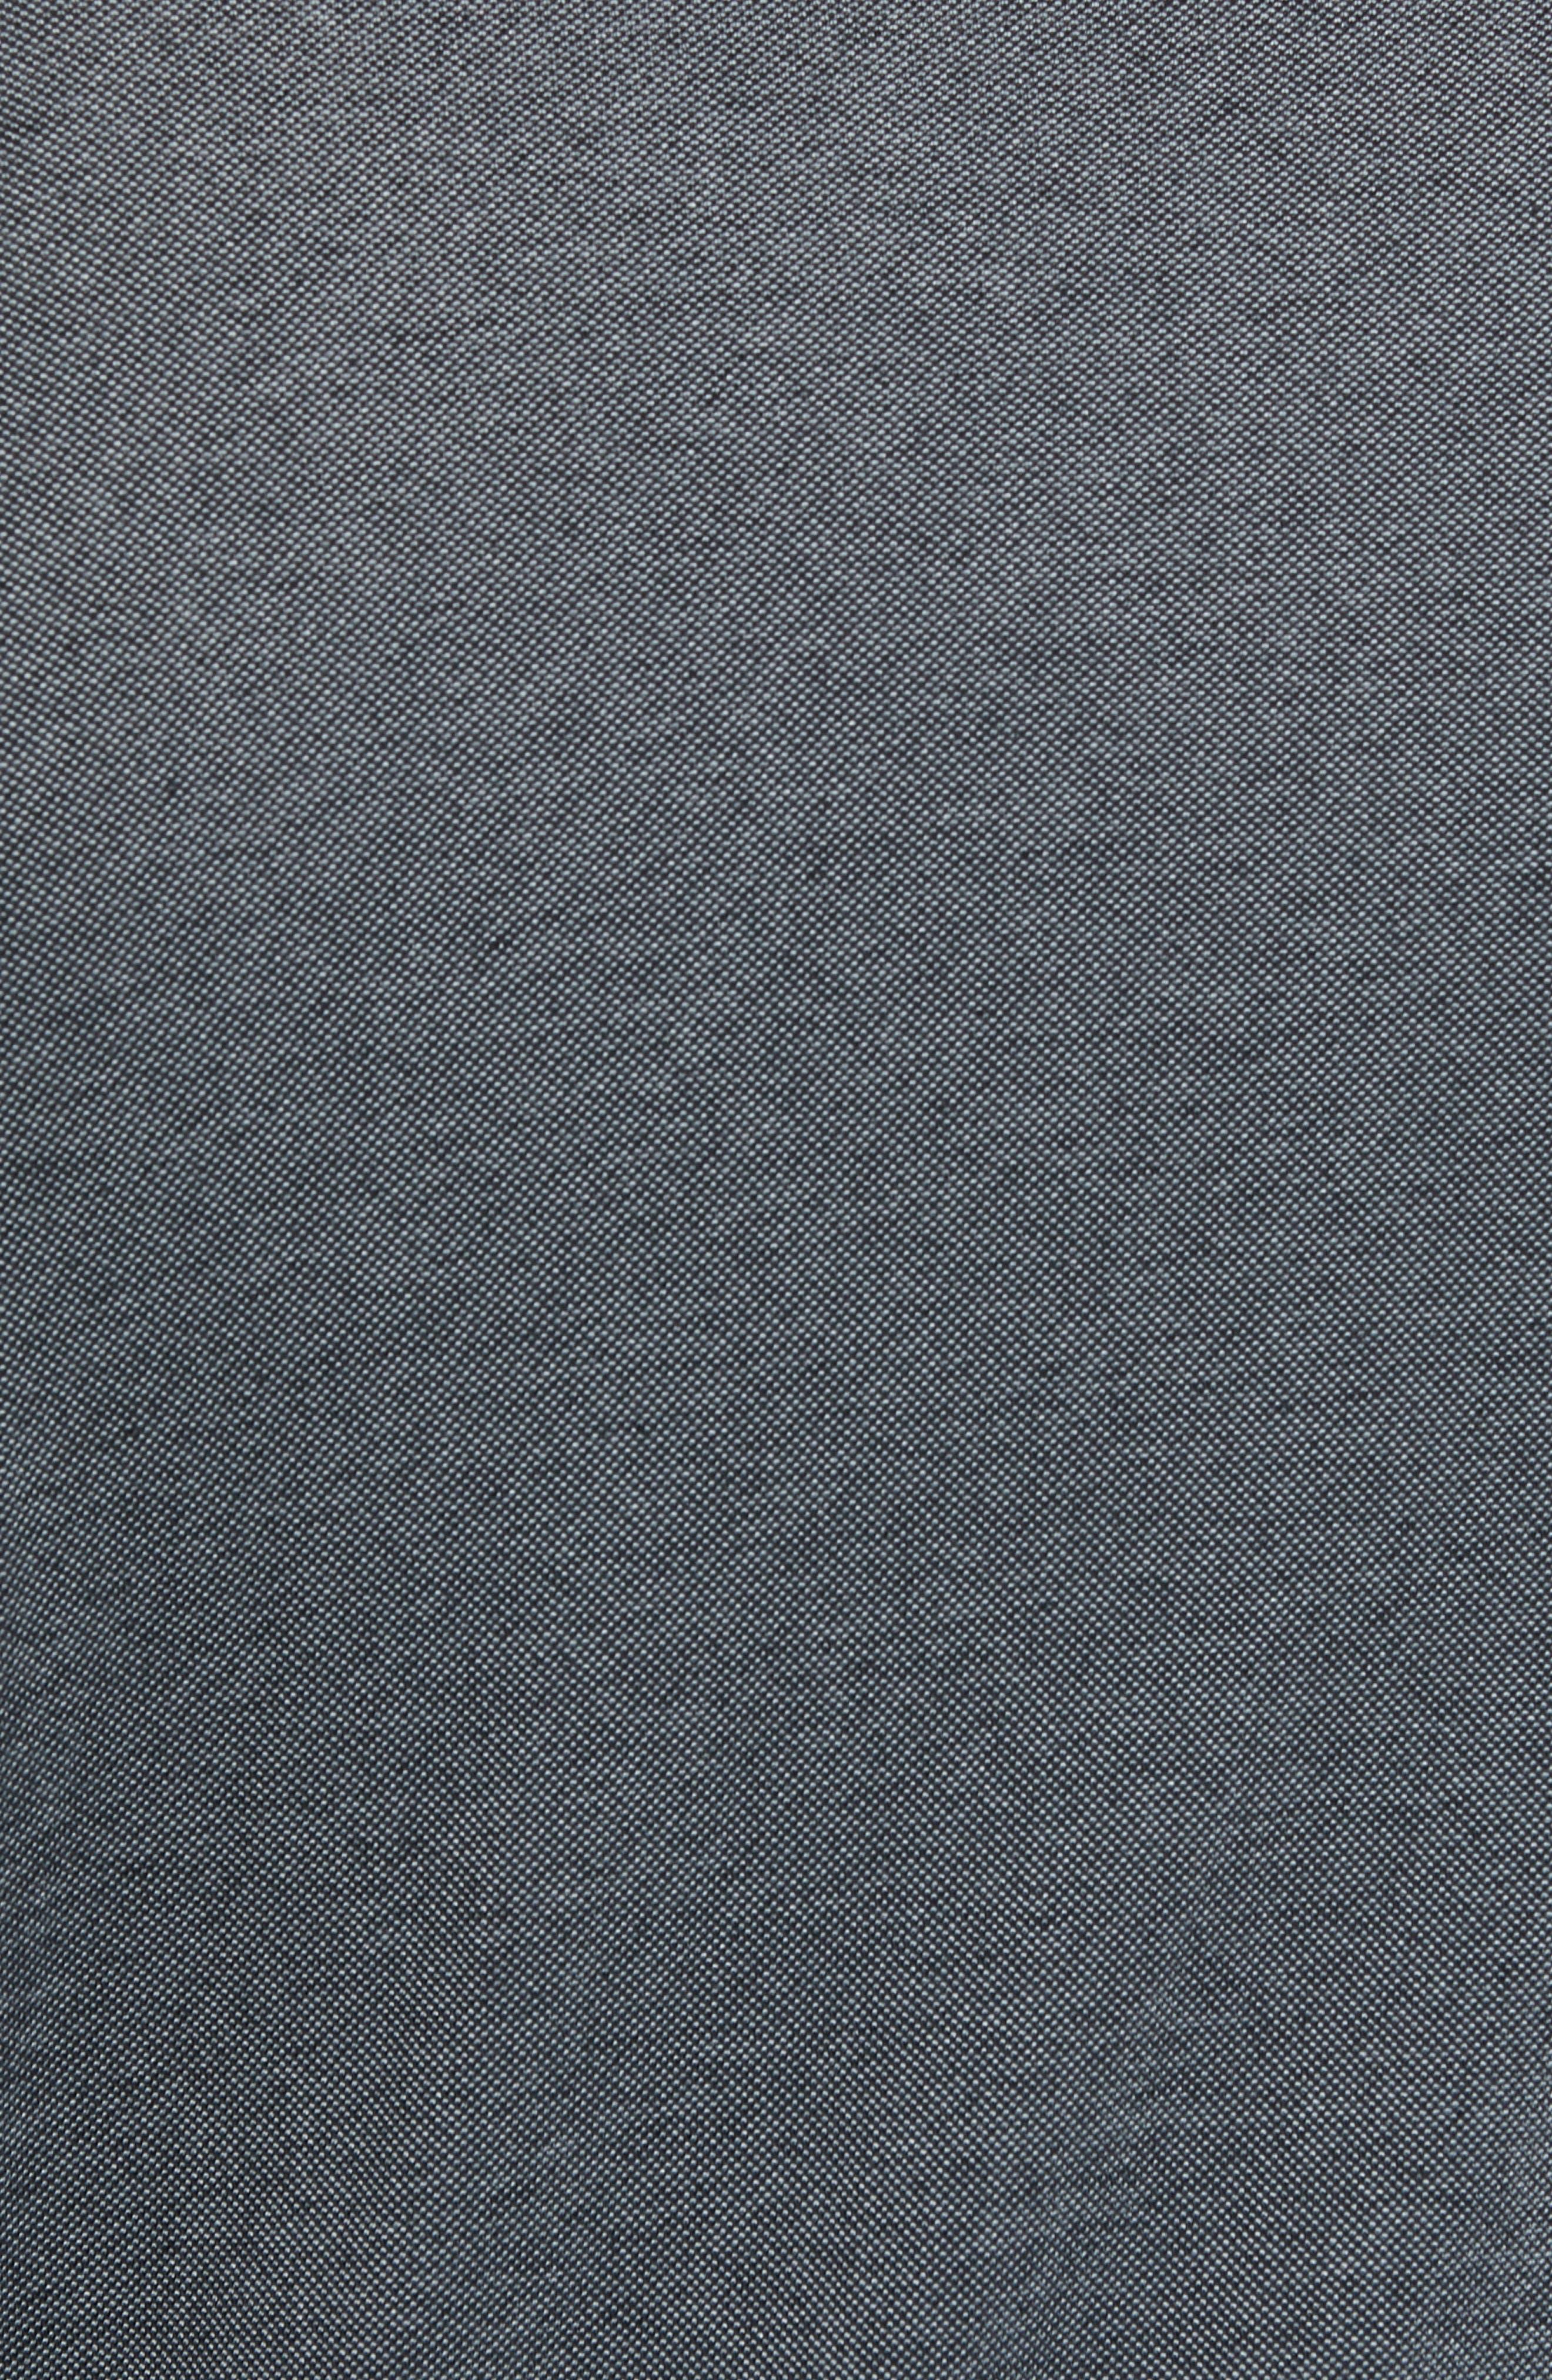 Grand Forks Long Sleeve Piqué T-Shirt,                             Alternate thumbnail 5, color,                             GREY